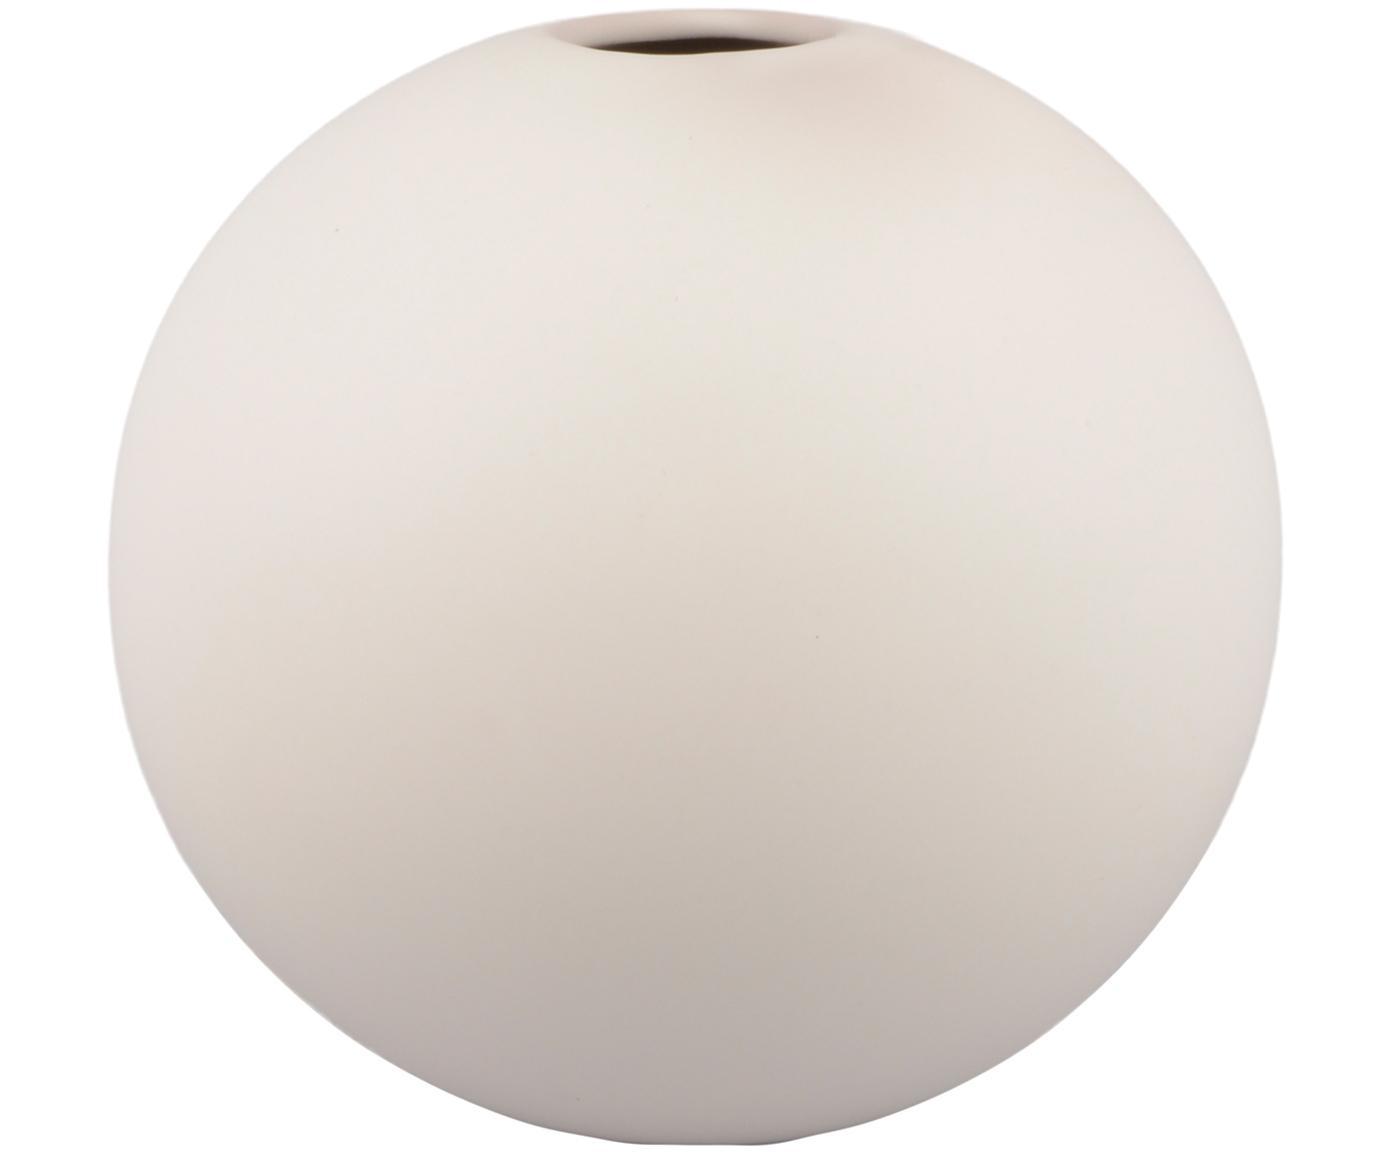 Kugel-Vase Rita aus Keramik, Keramik, Weiß, Ø 12 x H 12 cm